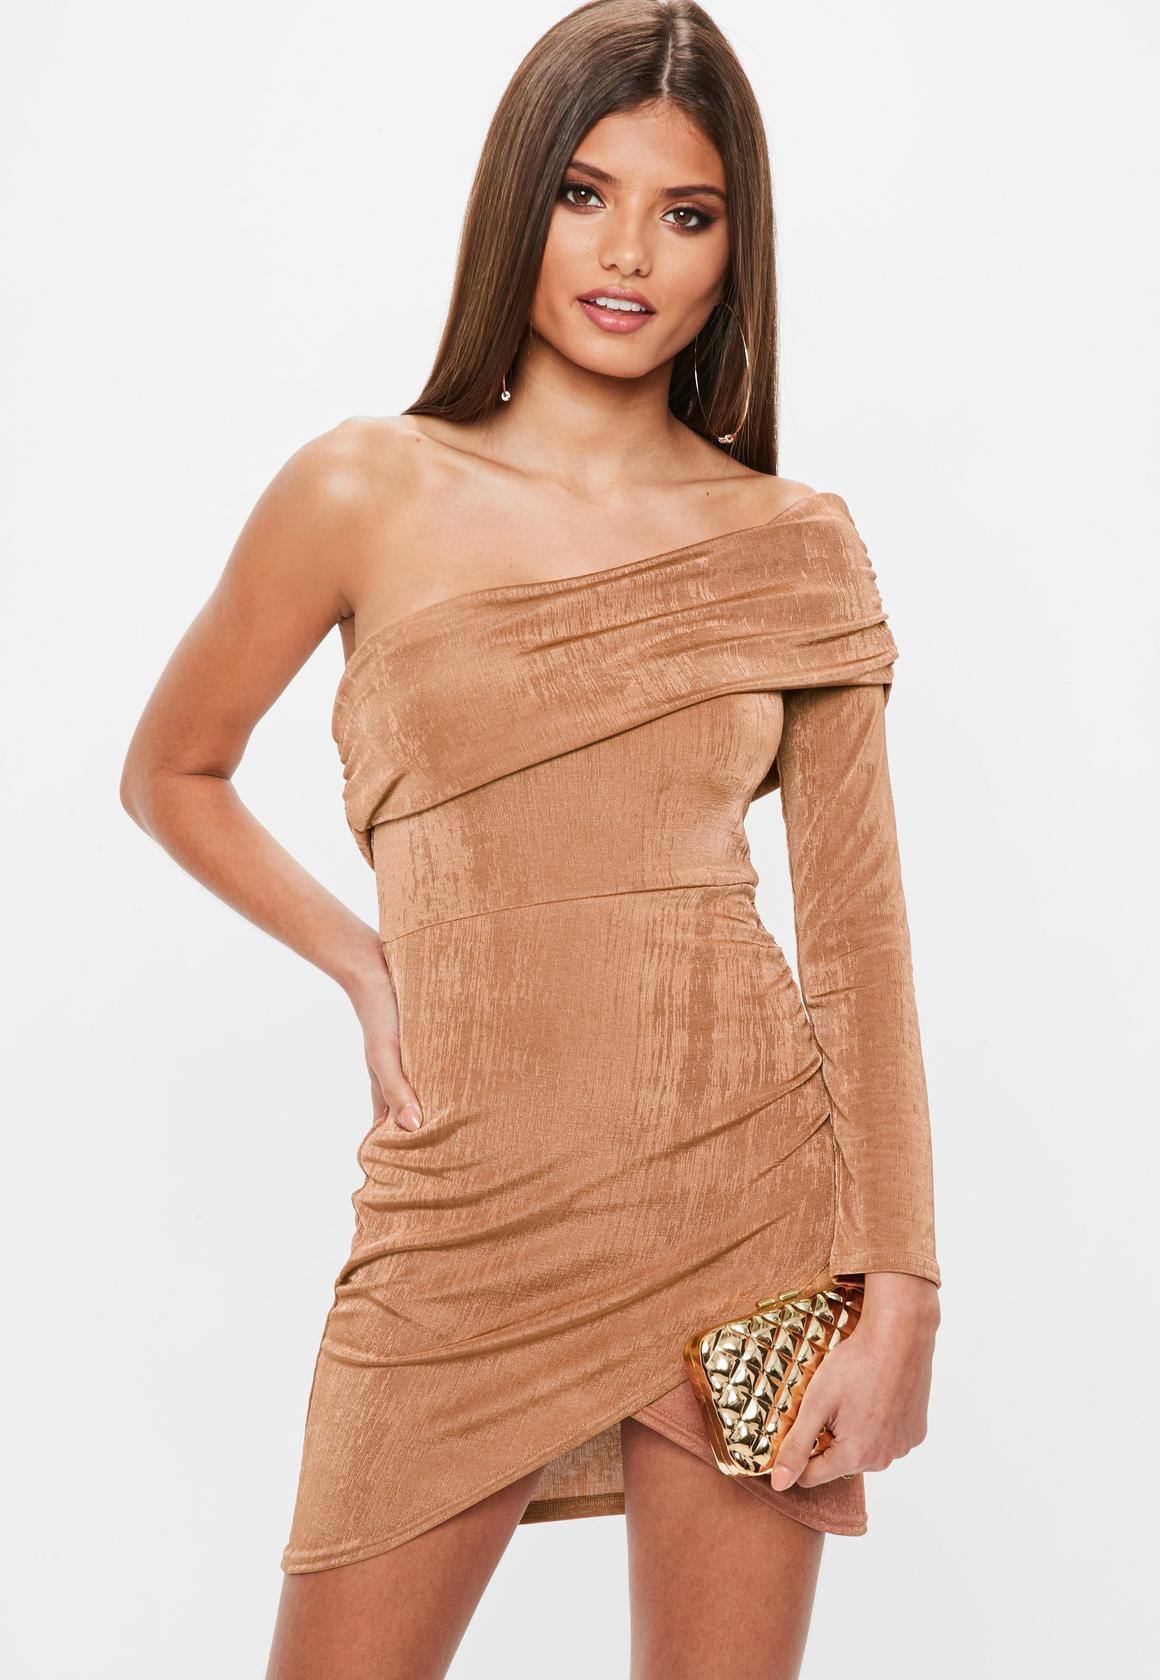 brown-slinky-one-shoulder-overlay-dress